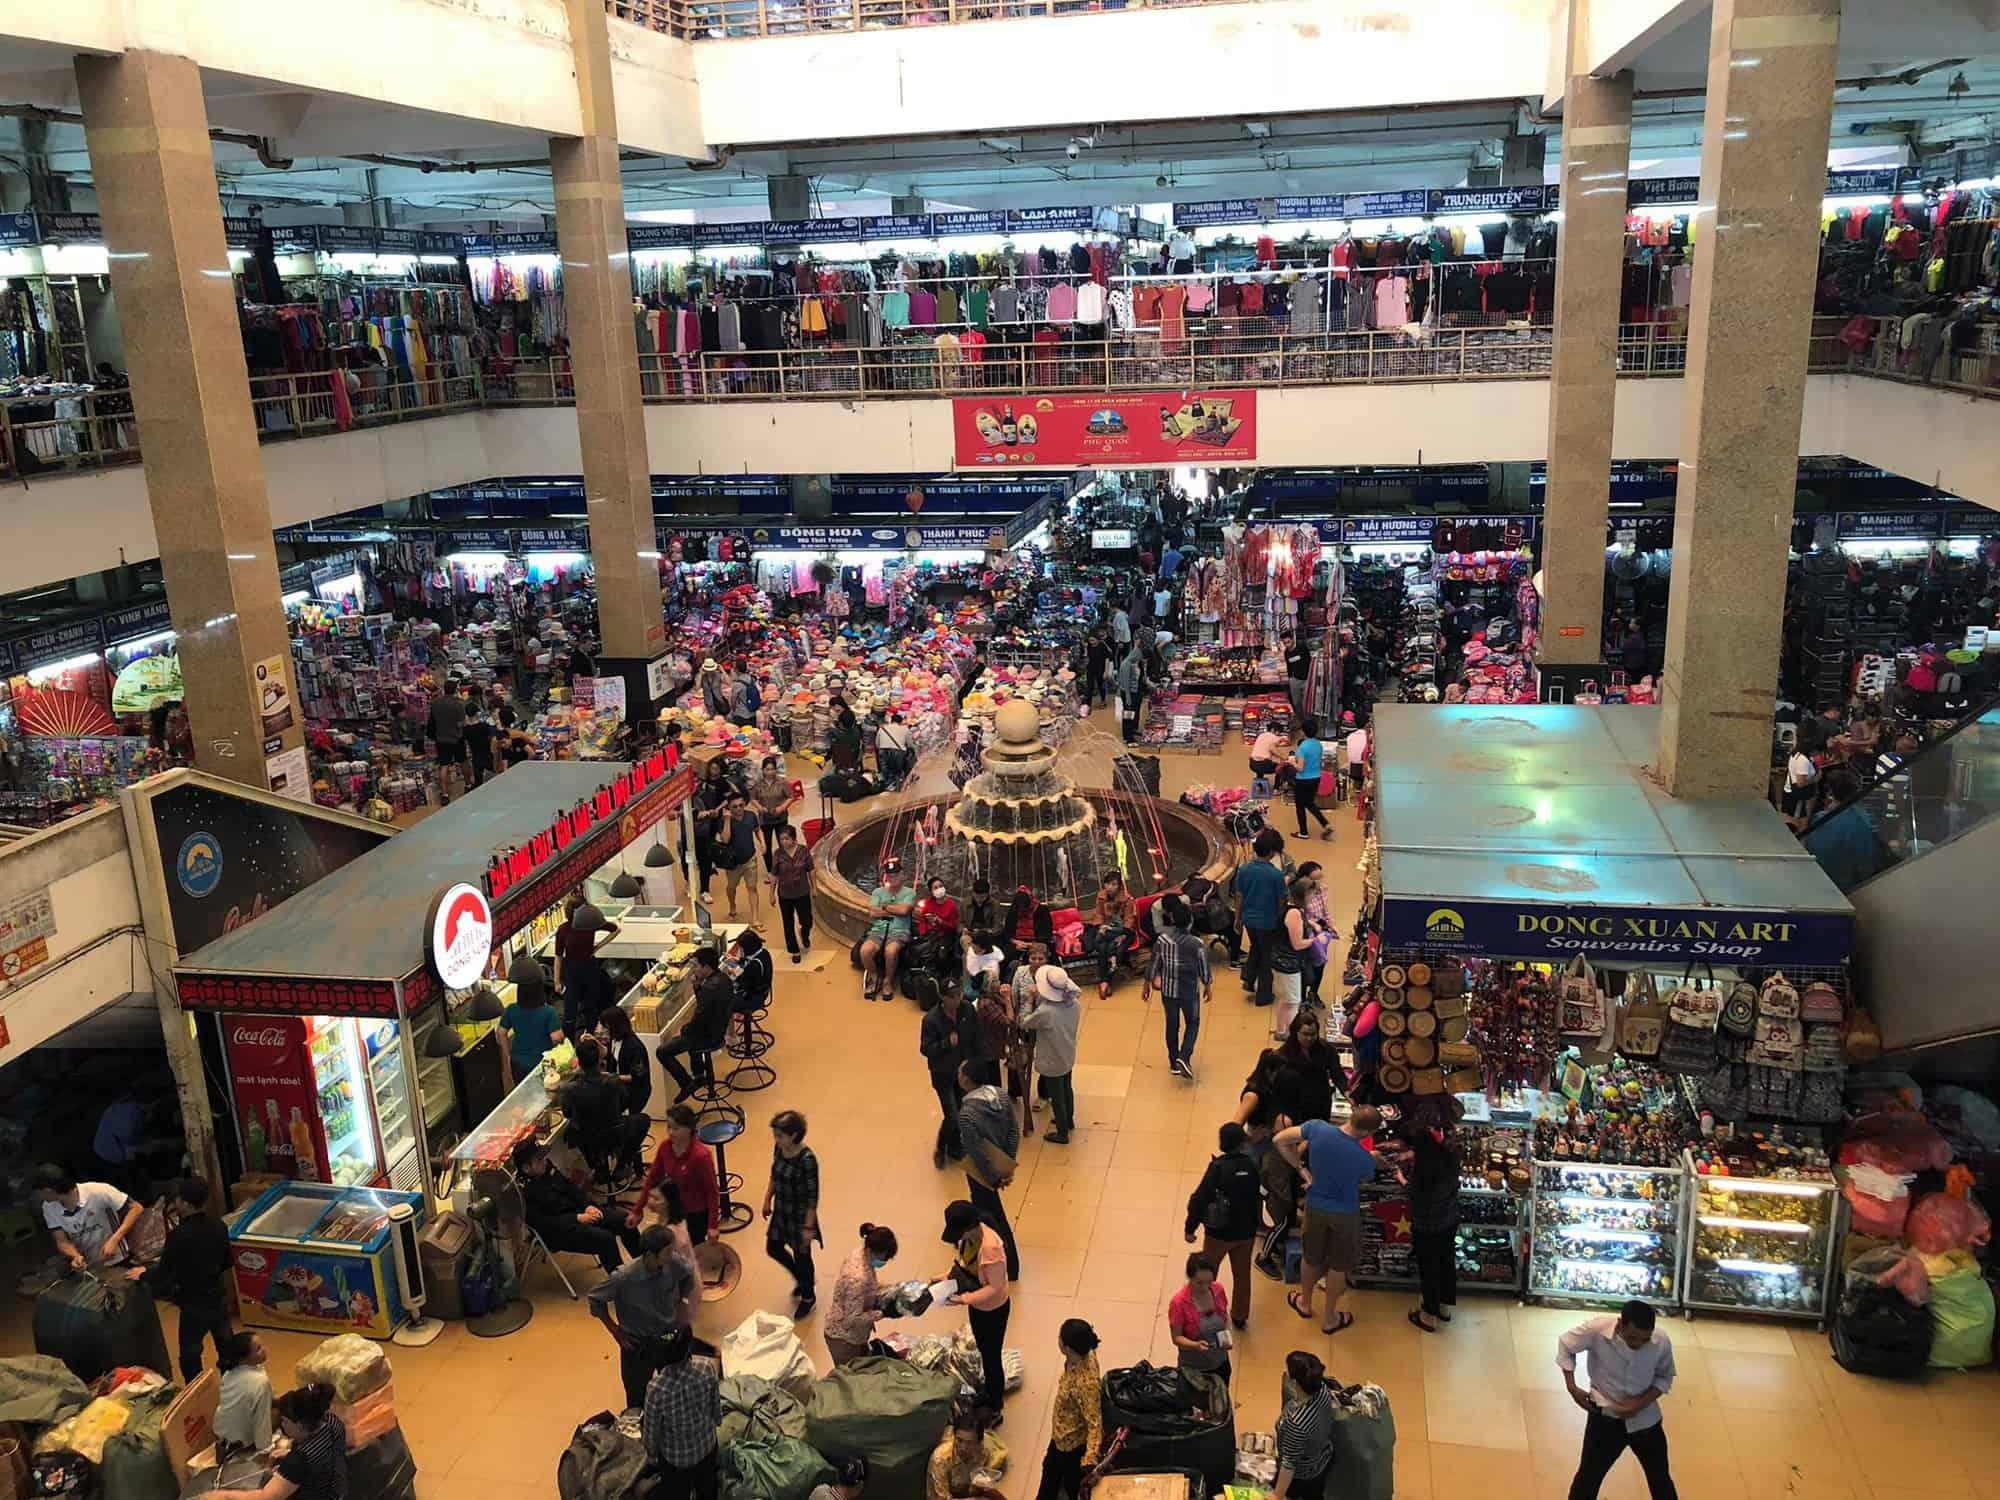 Dong Xuan Day market